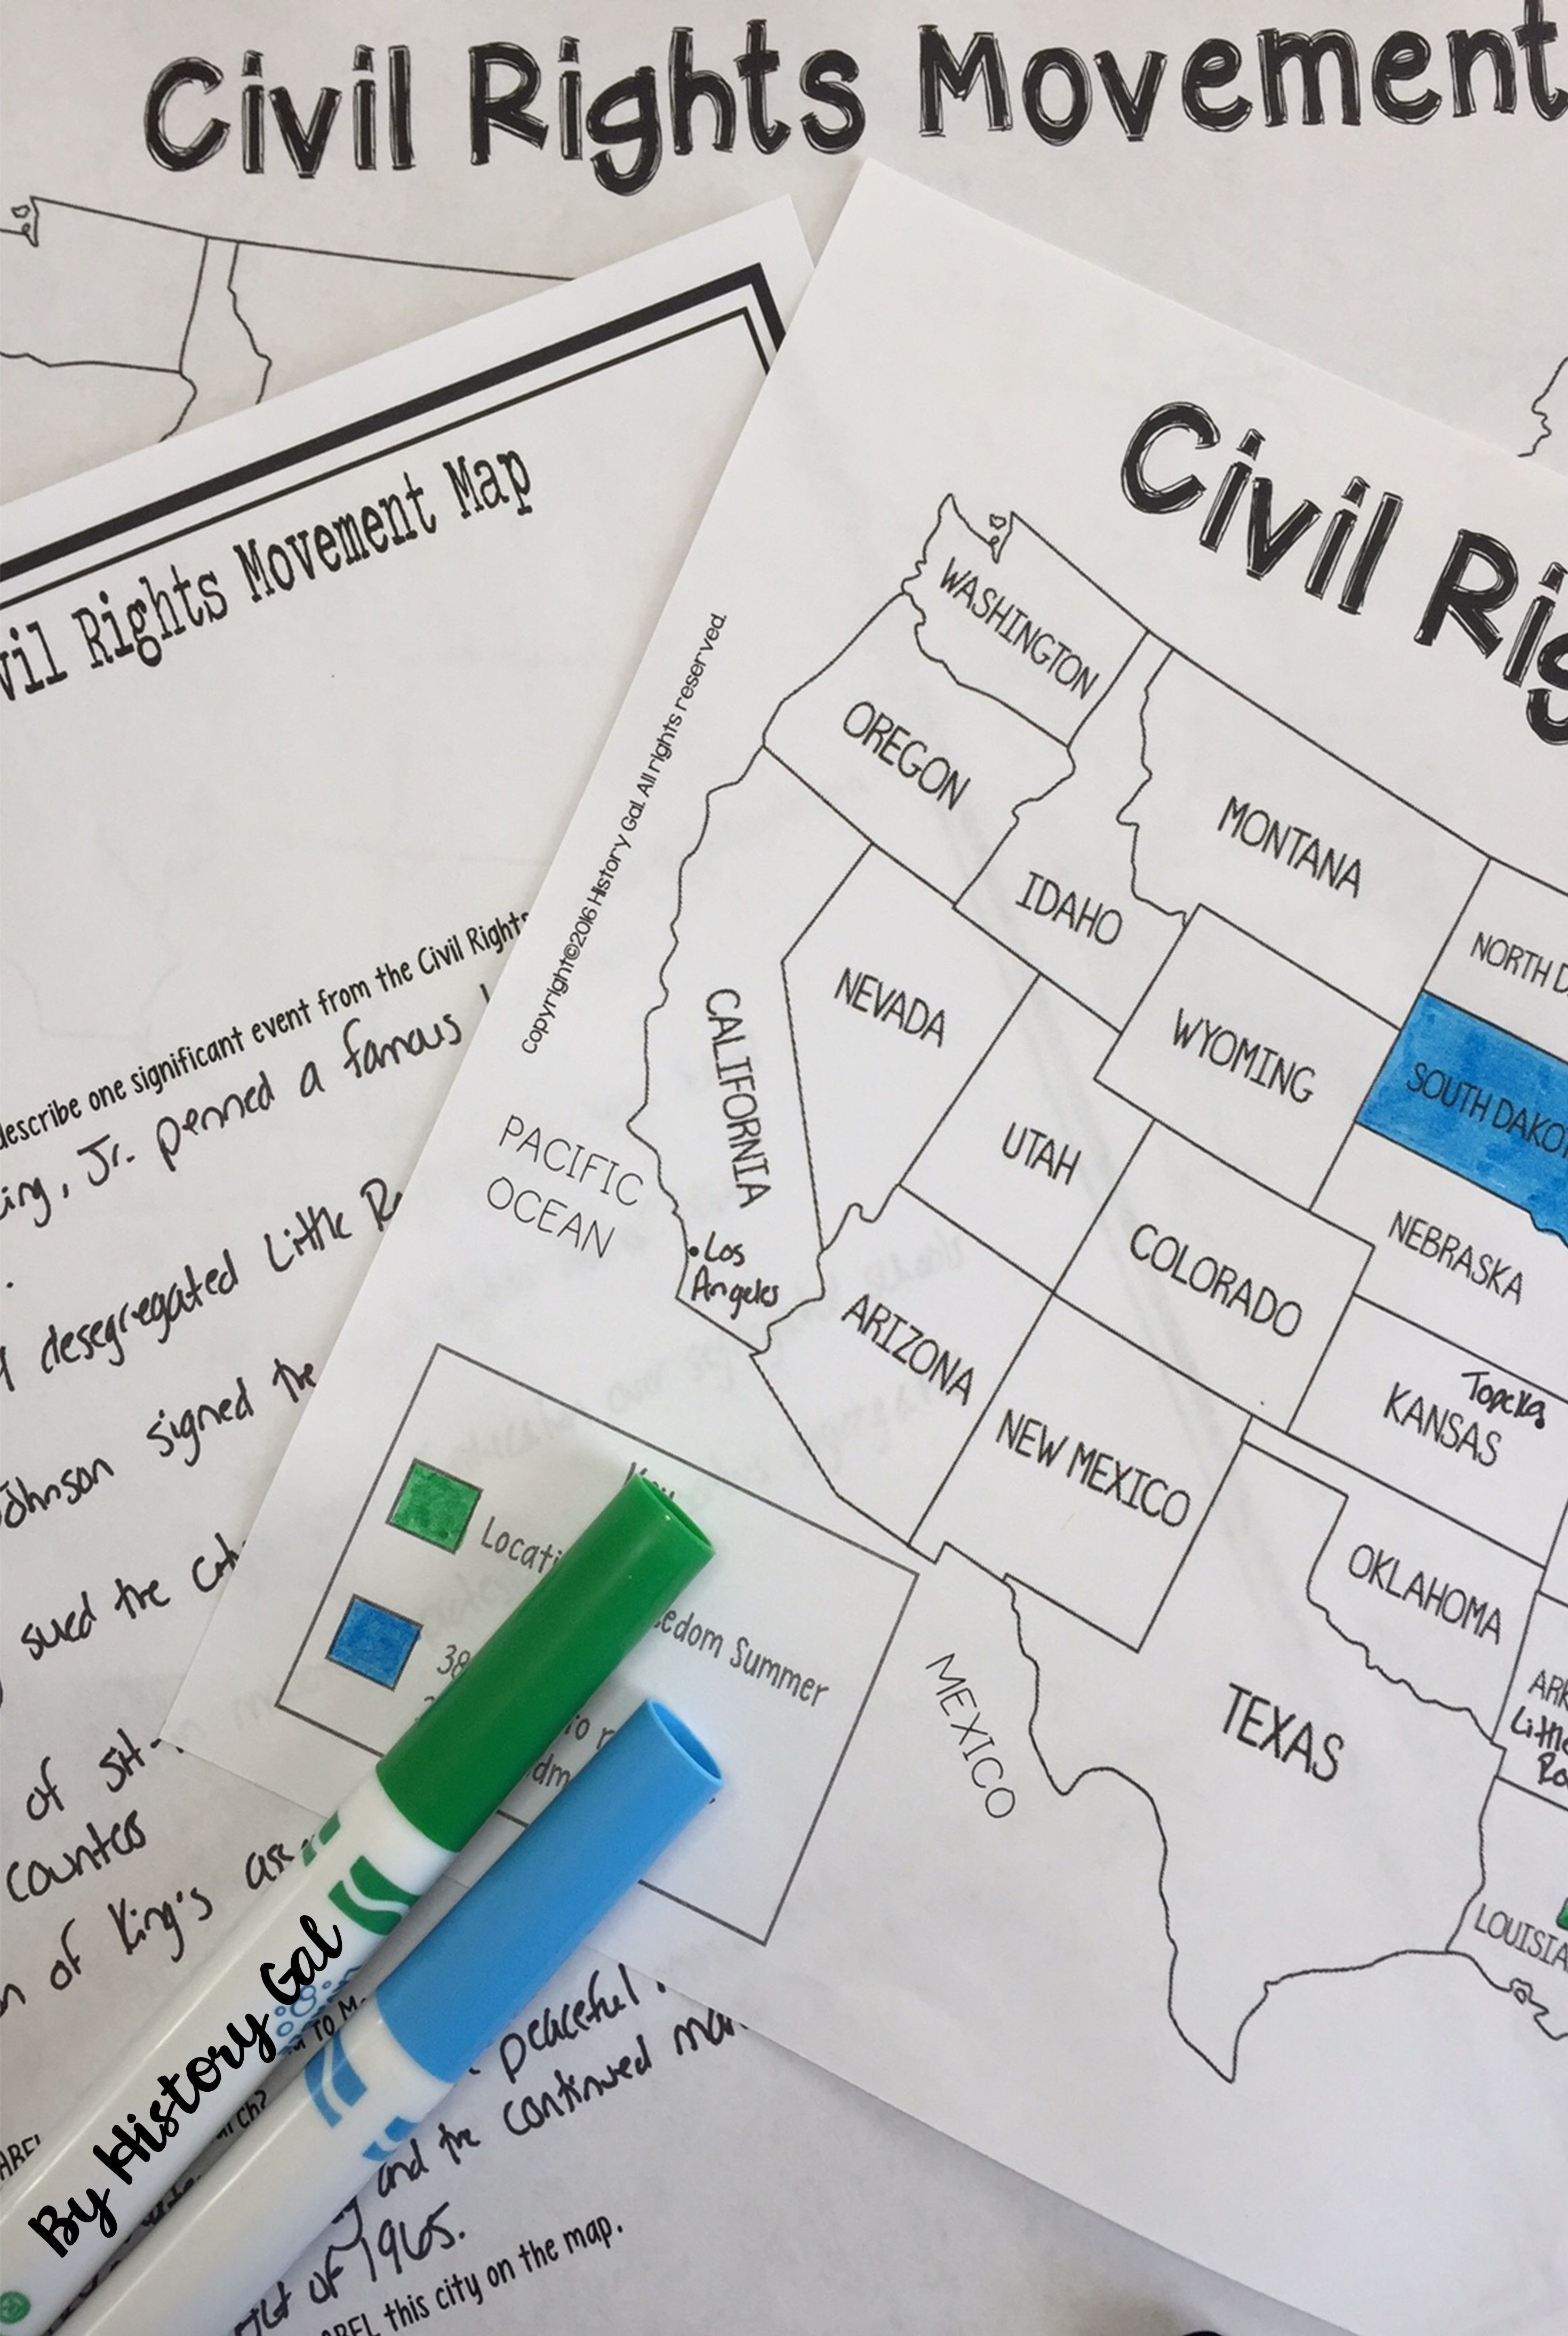 Civil Rights Movement Map (Print and Digital)   Civil rights movement [ 4380 x 2940 Pixel ]